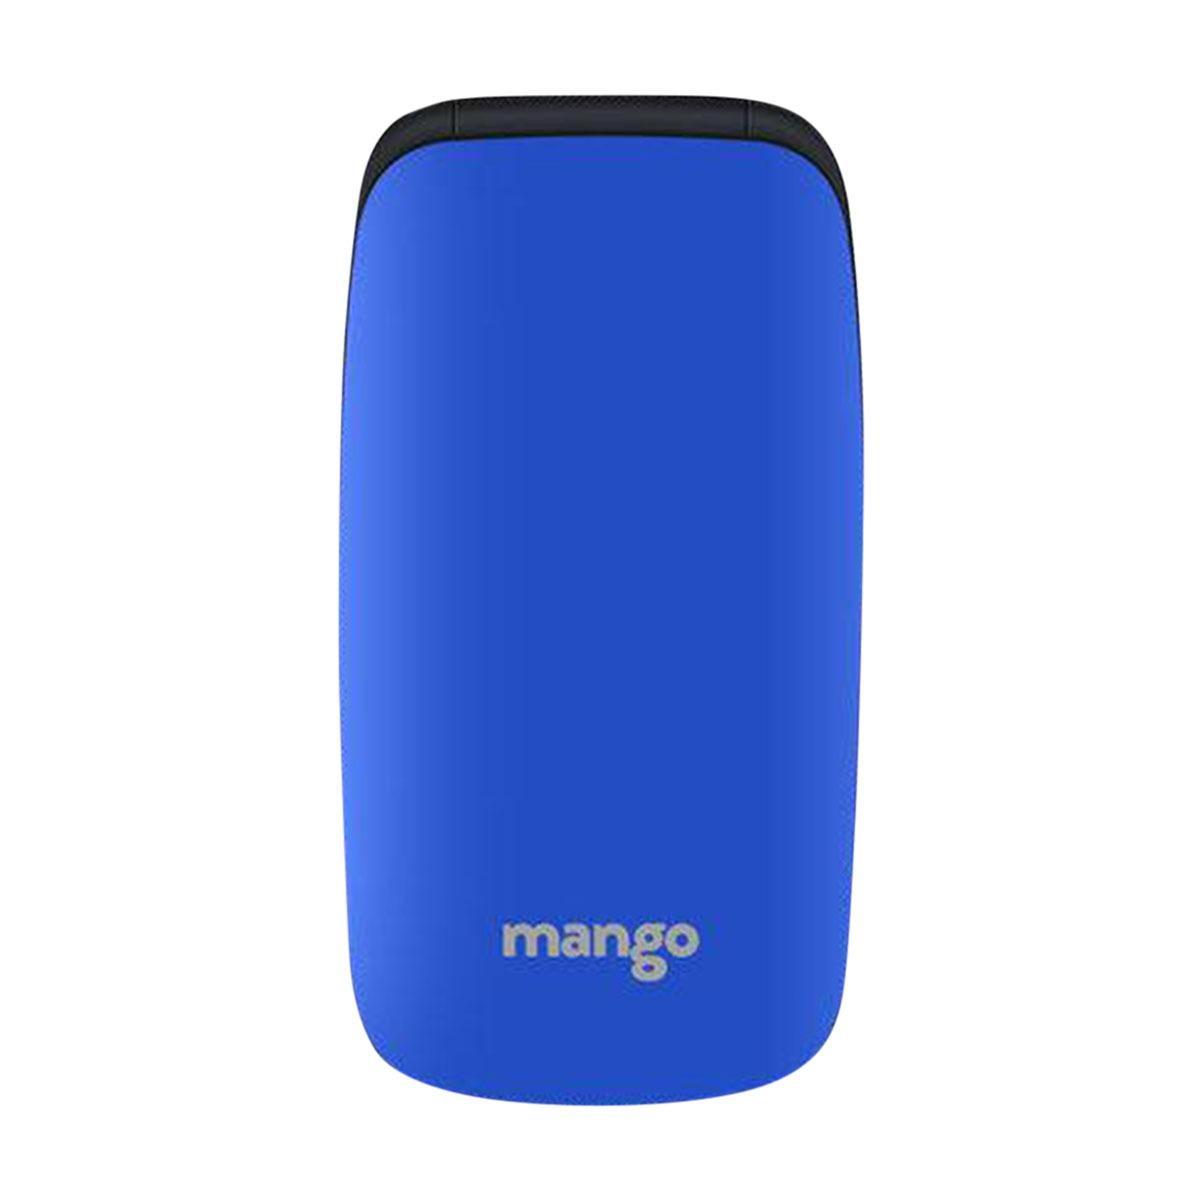 Mango MF1 - Folding Feature Phone - Money Detector - MTK Chipset - Dual SIM  - 0 3MP Camera - Blue